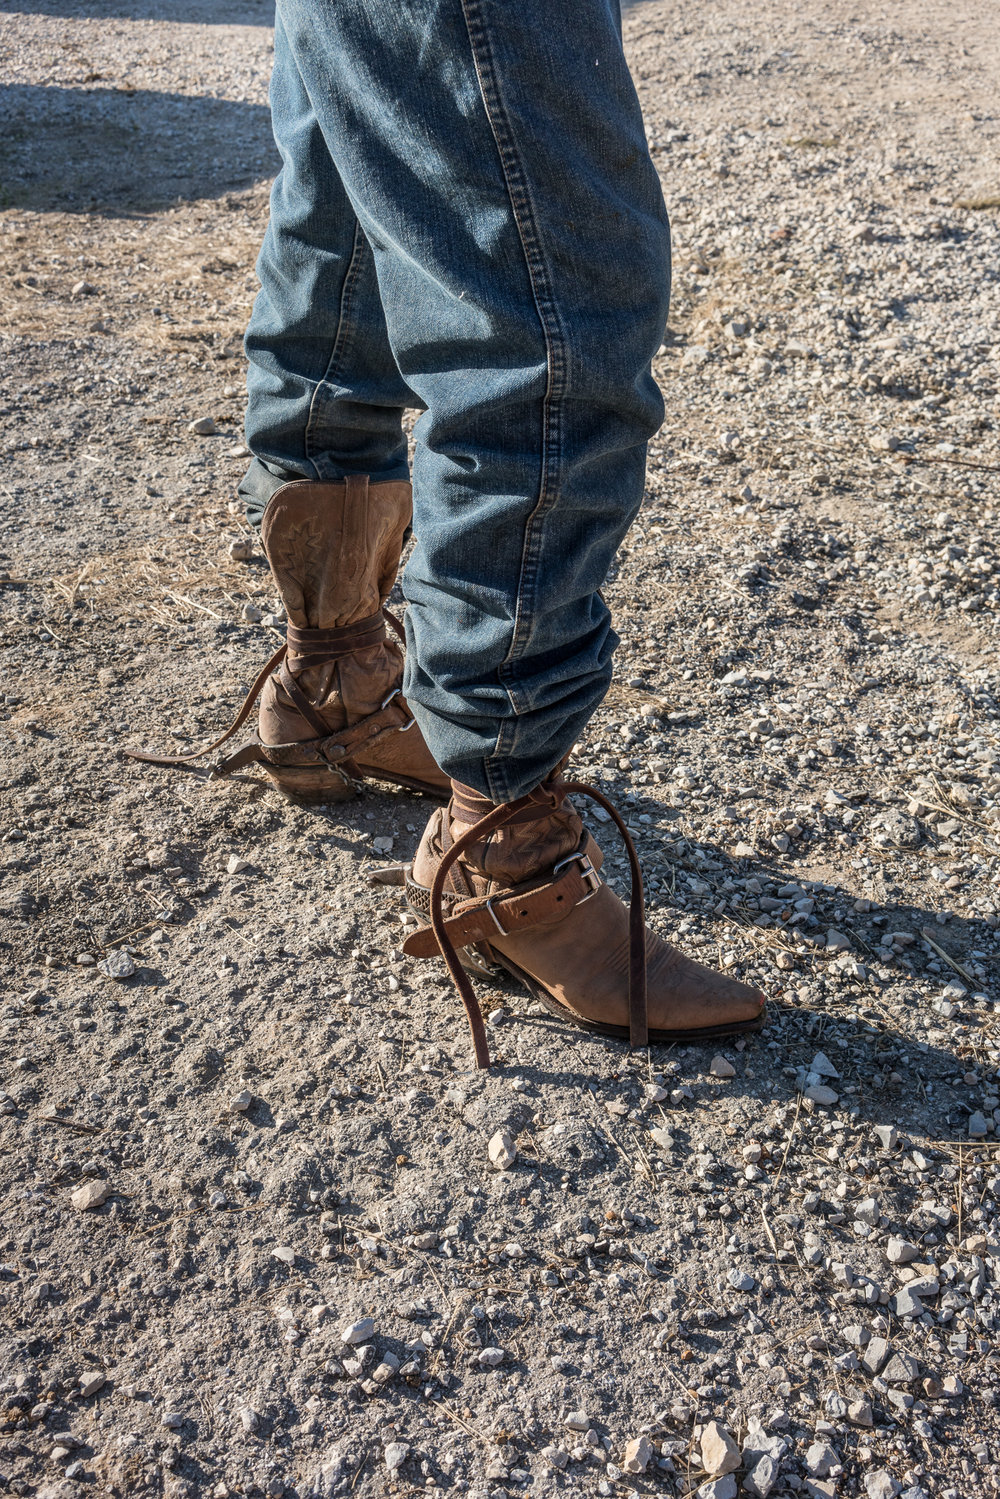 Mark's Boots, Hillsboro, Missouri, 2017